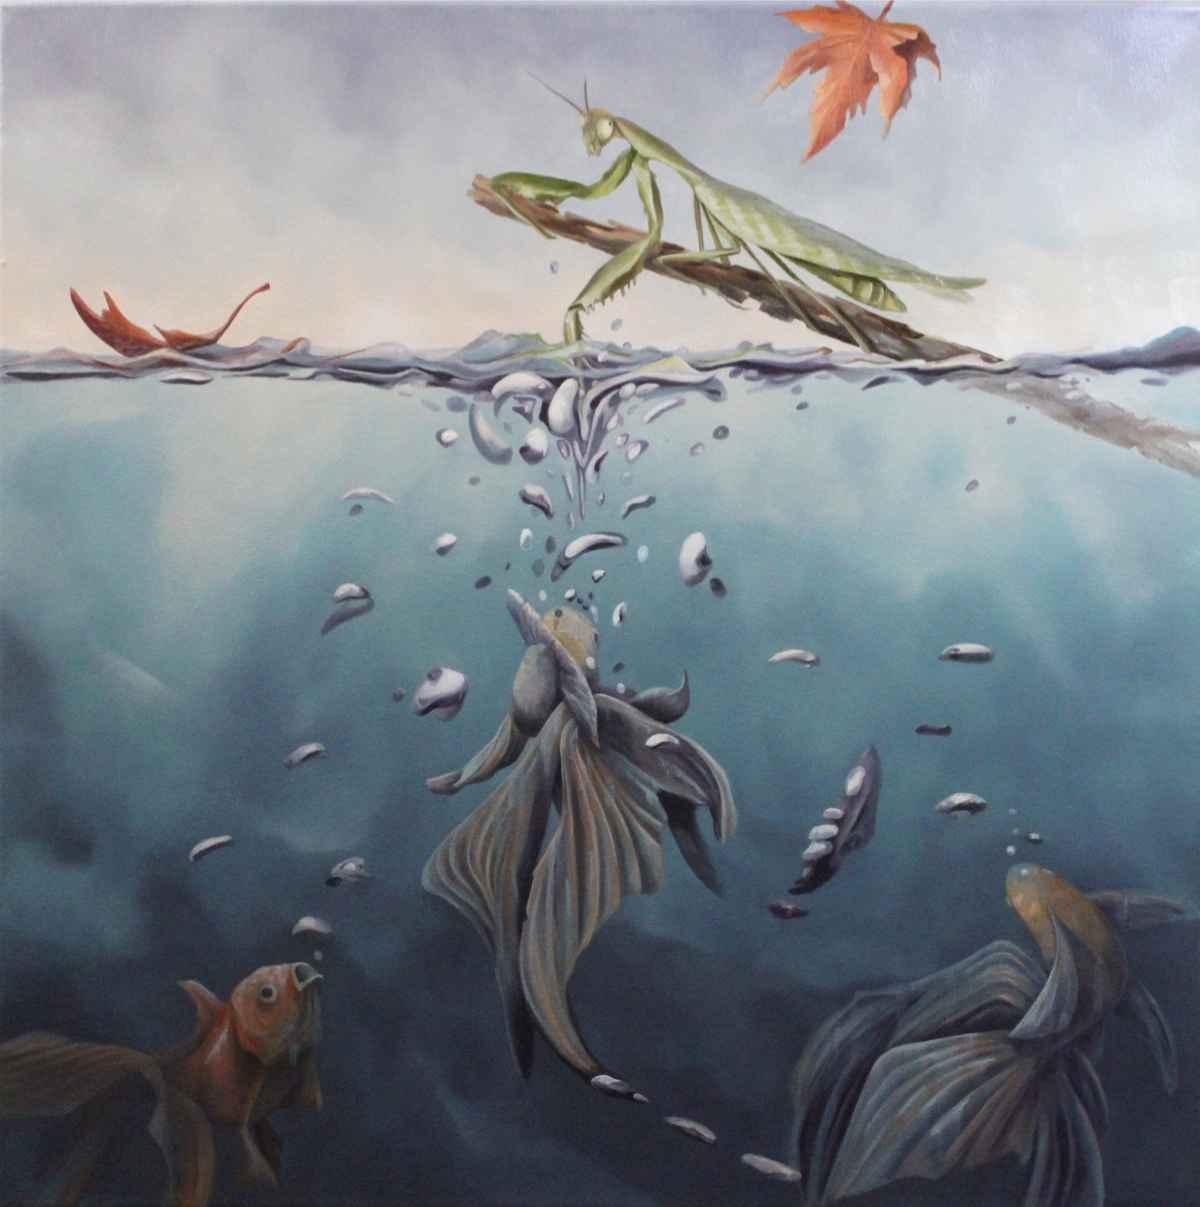 Mantis by  Steve Bowersock - Masterpiece Online